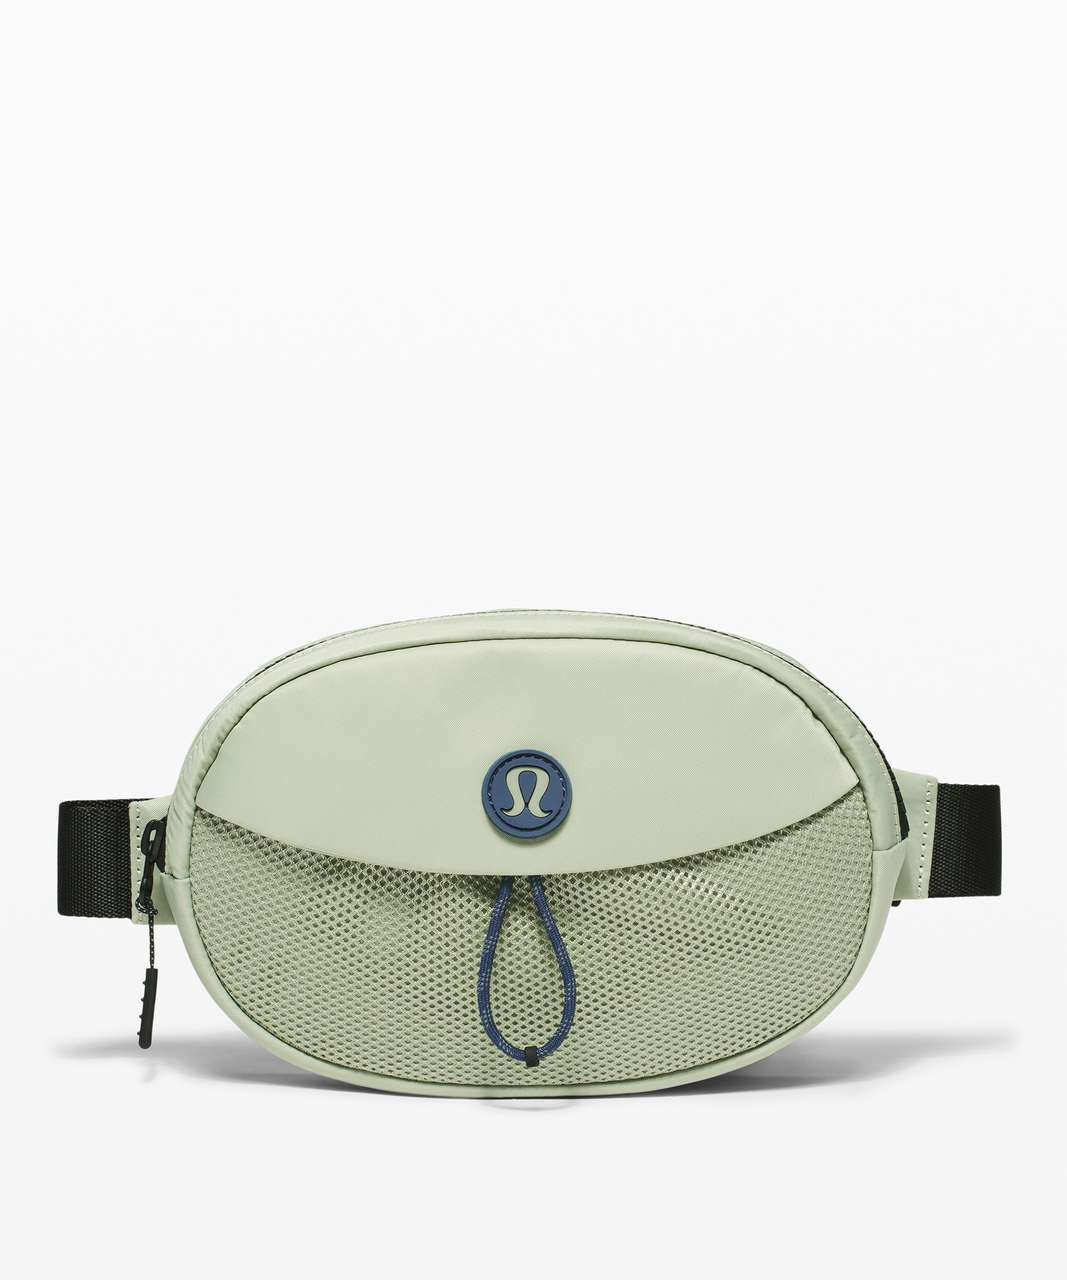 Lululemon Take It On Belt Bag *1L - Green Fern / Mineral Blue